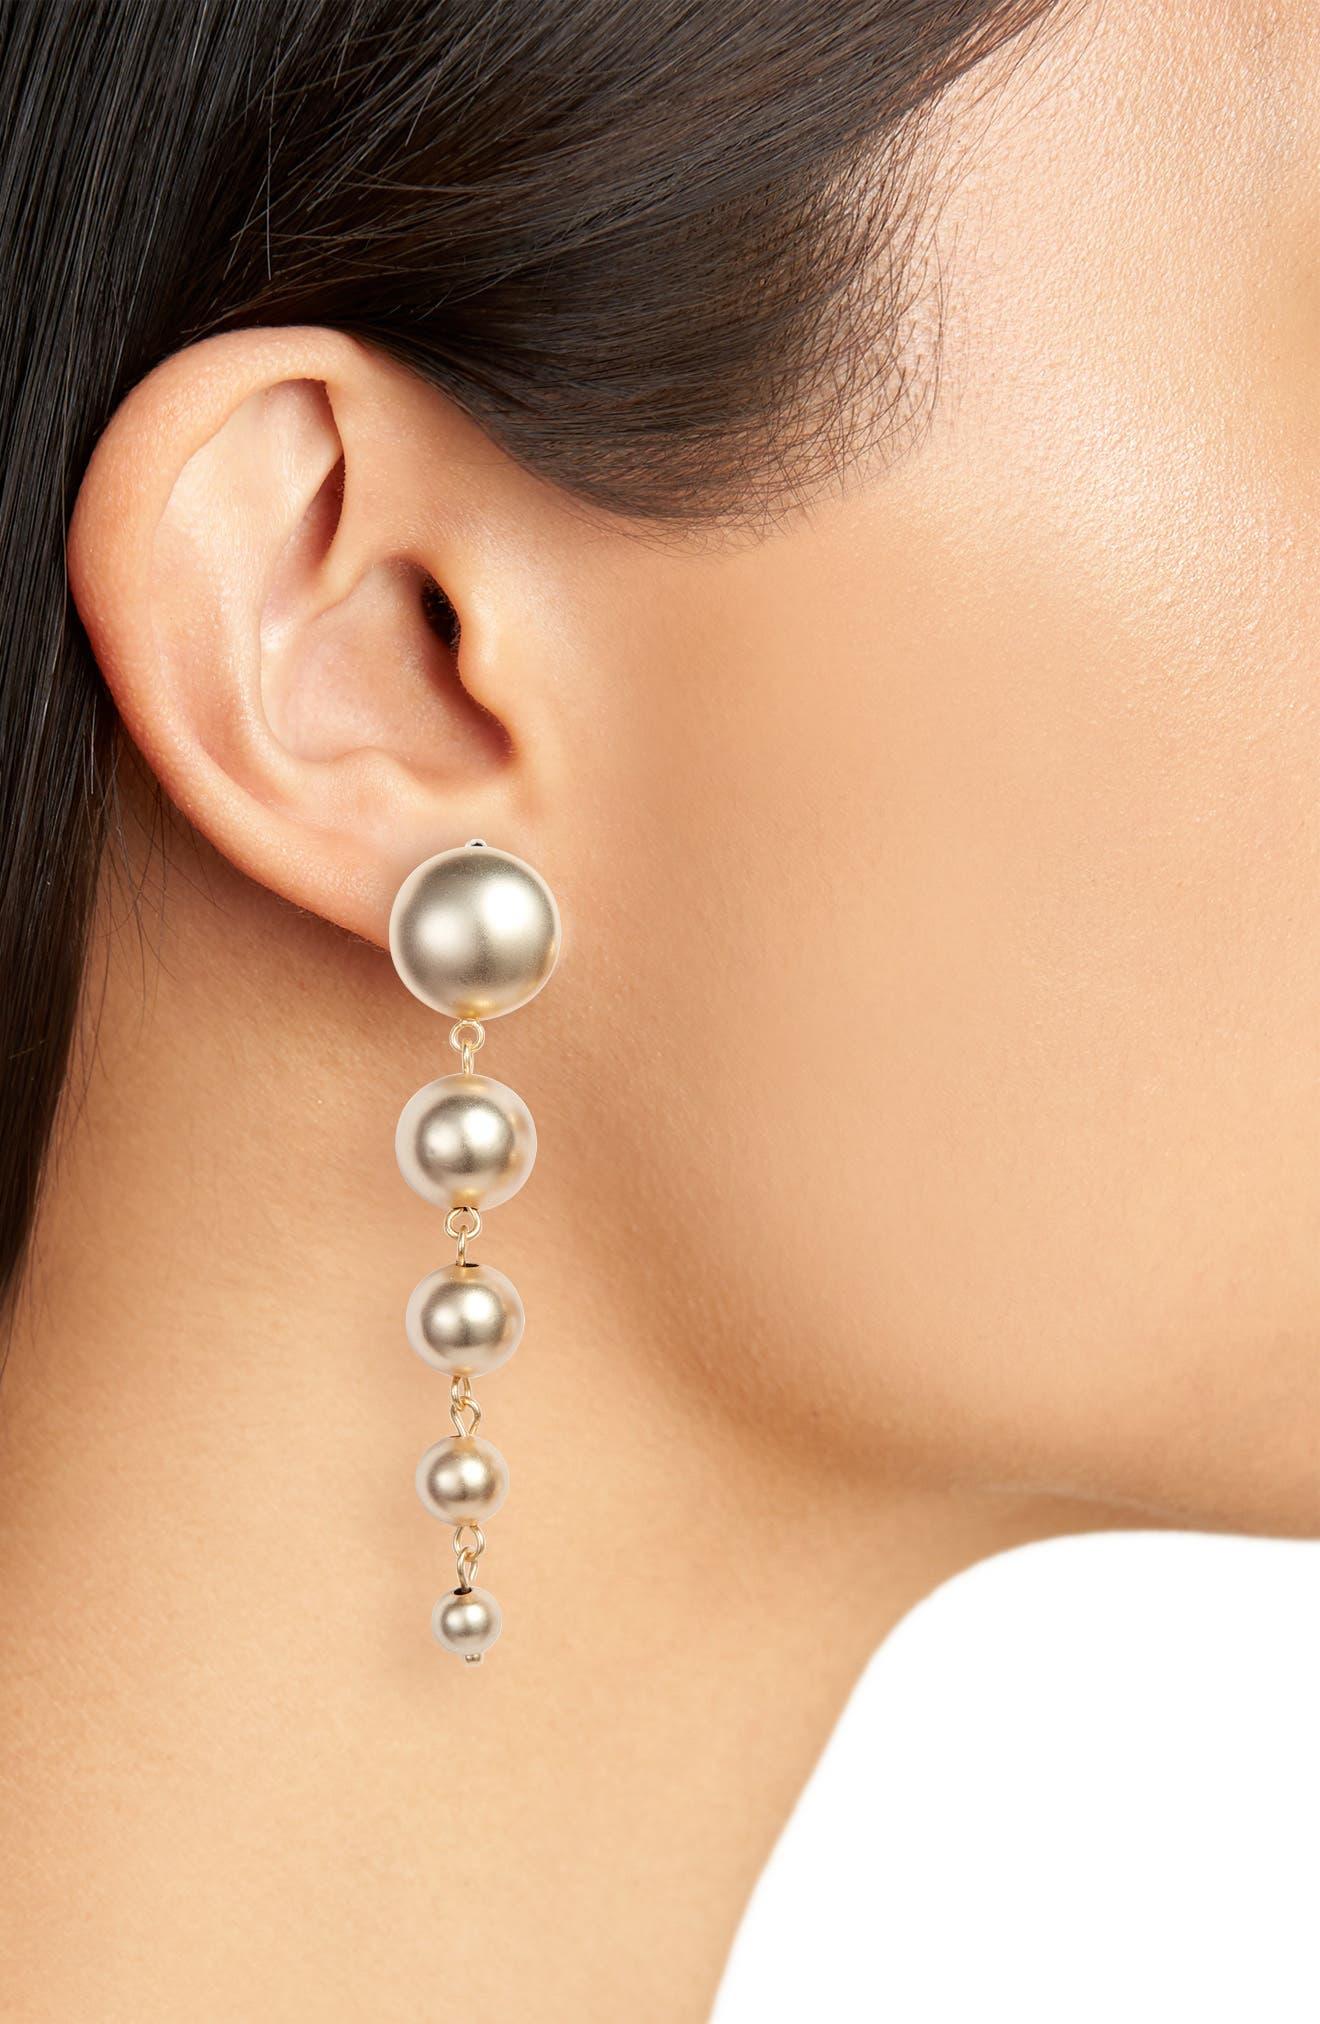 5-Sphere Graduated Drop Earrings,                             Alternate thumbnail 4, color,